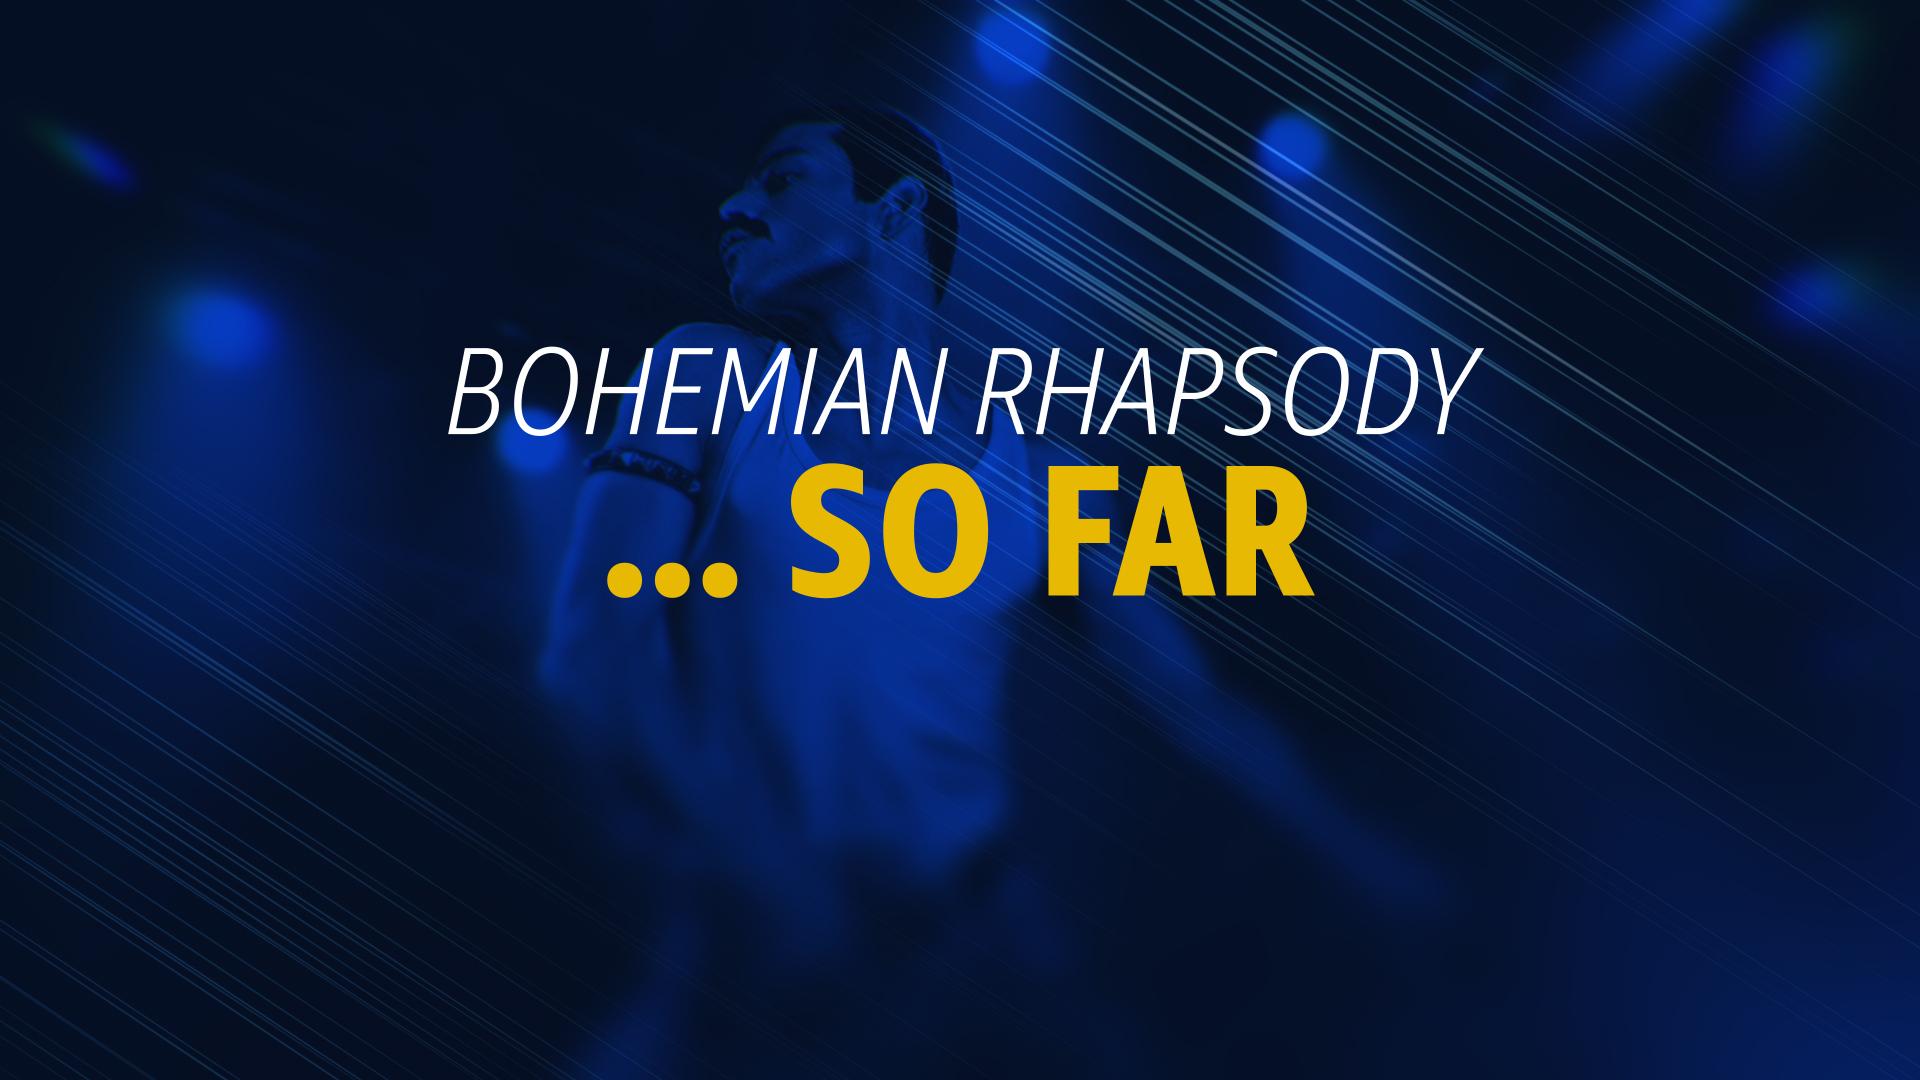 bohemian rhapsody imdb